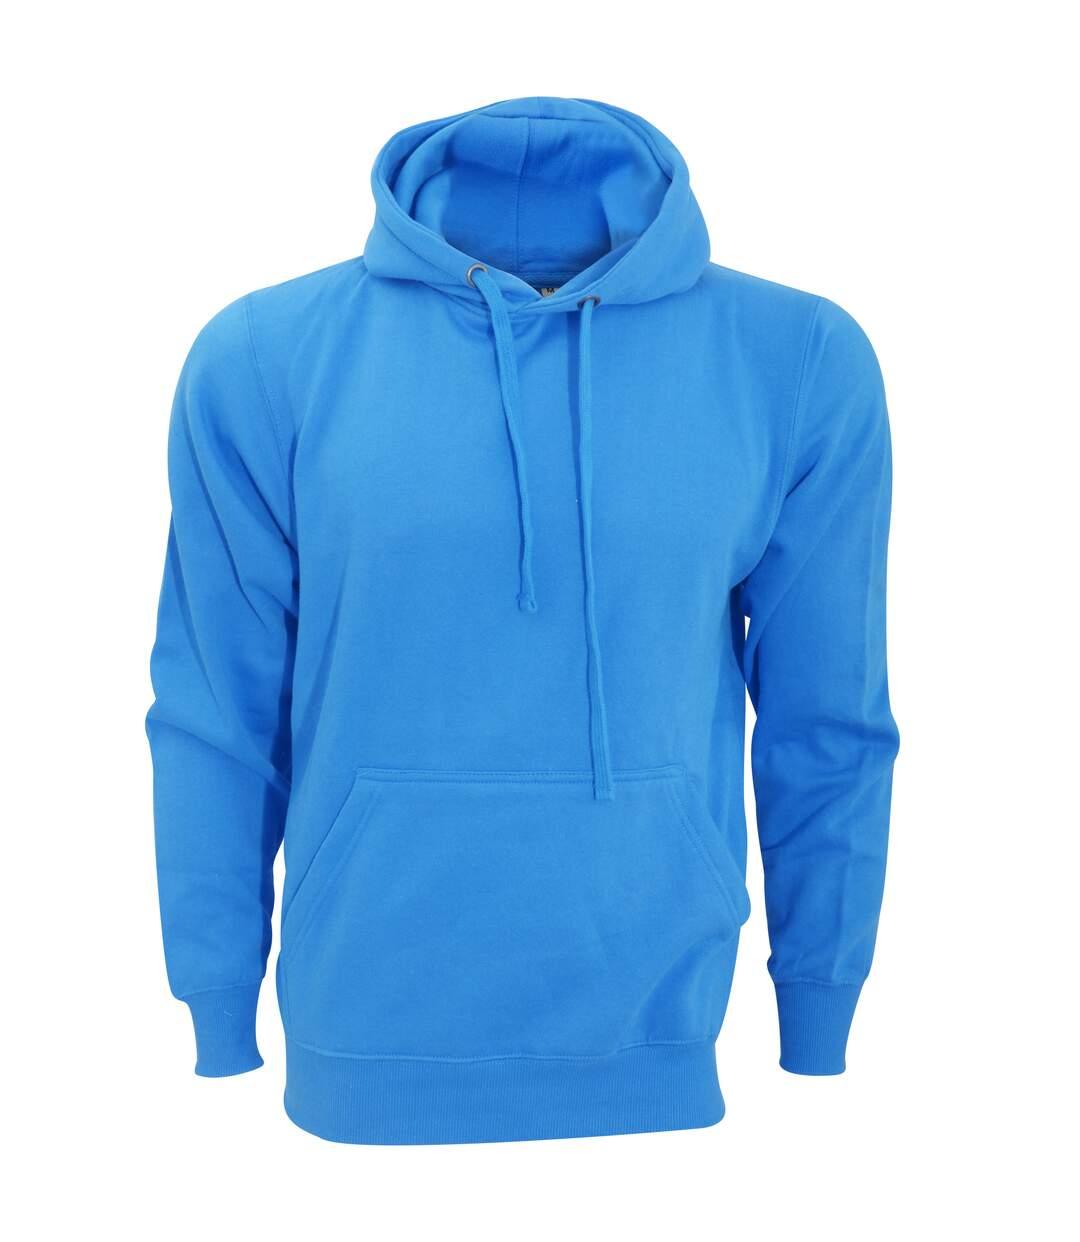 FDM Unisex Tagless Hooded Sweatshirt / Hoodie (Sapphire) - UTBC2031